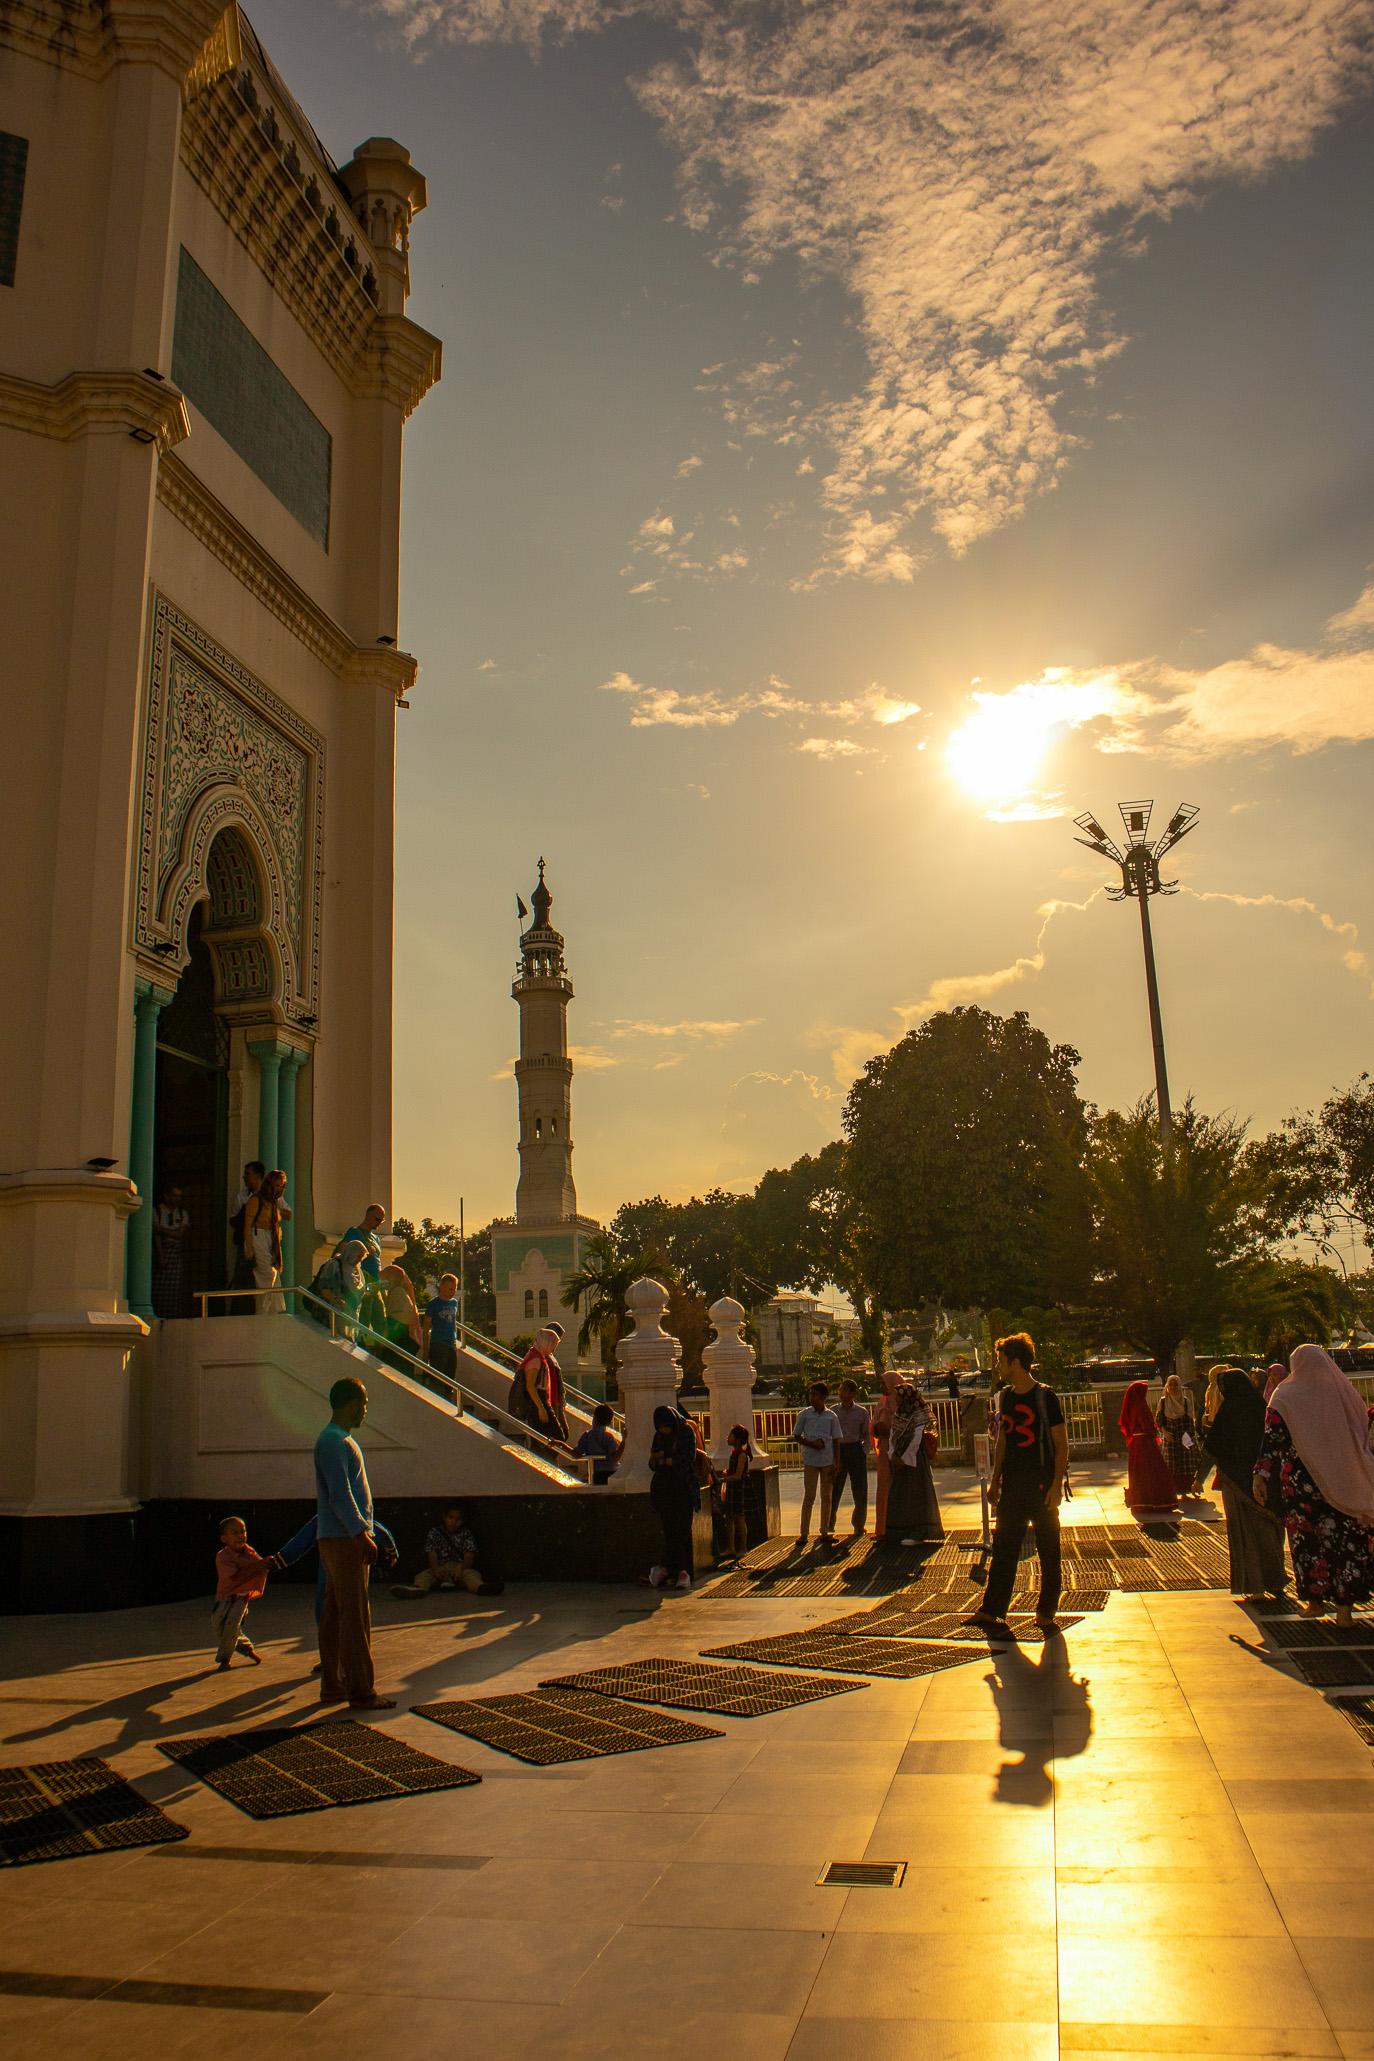 https://bubo.sk/uploads/galleries/7542/tomashornak_indonezia_sumatra_img_0020-1-14.jpg